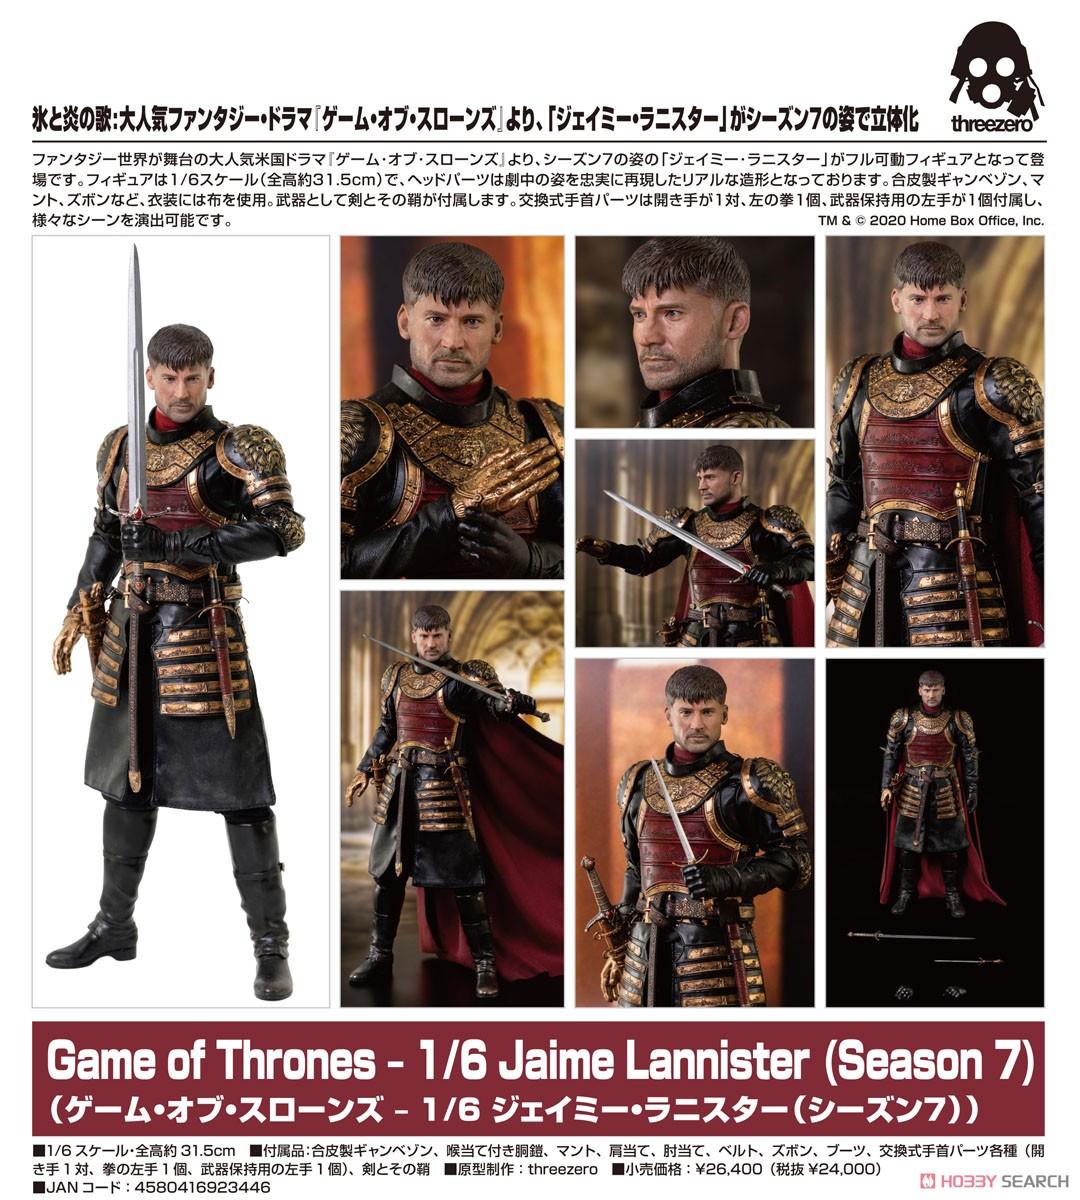 Game of Thrones『ジェイミー・ラニスター(Jaime Lannister)シーズン7』ゲーム・オブ・スローンズ 1/6 可動フィギュア-010